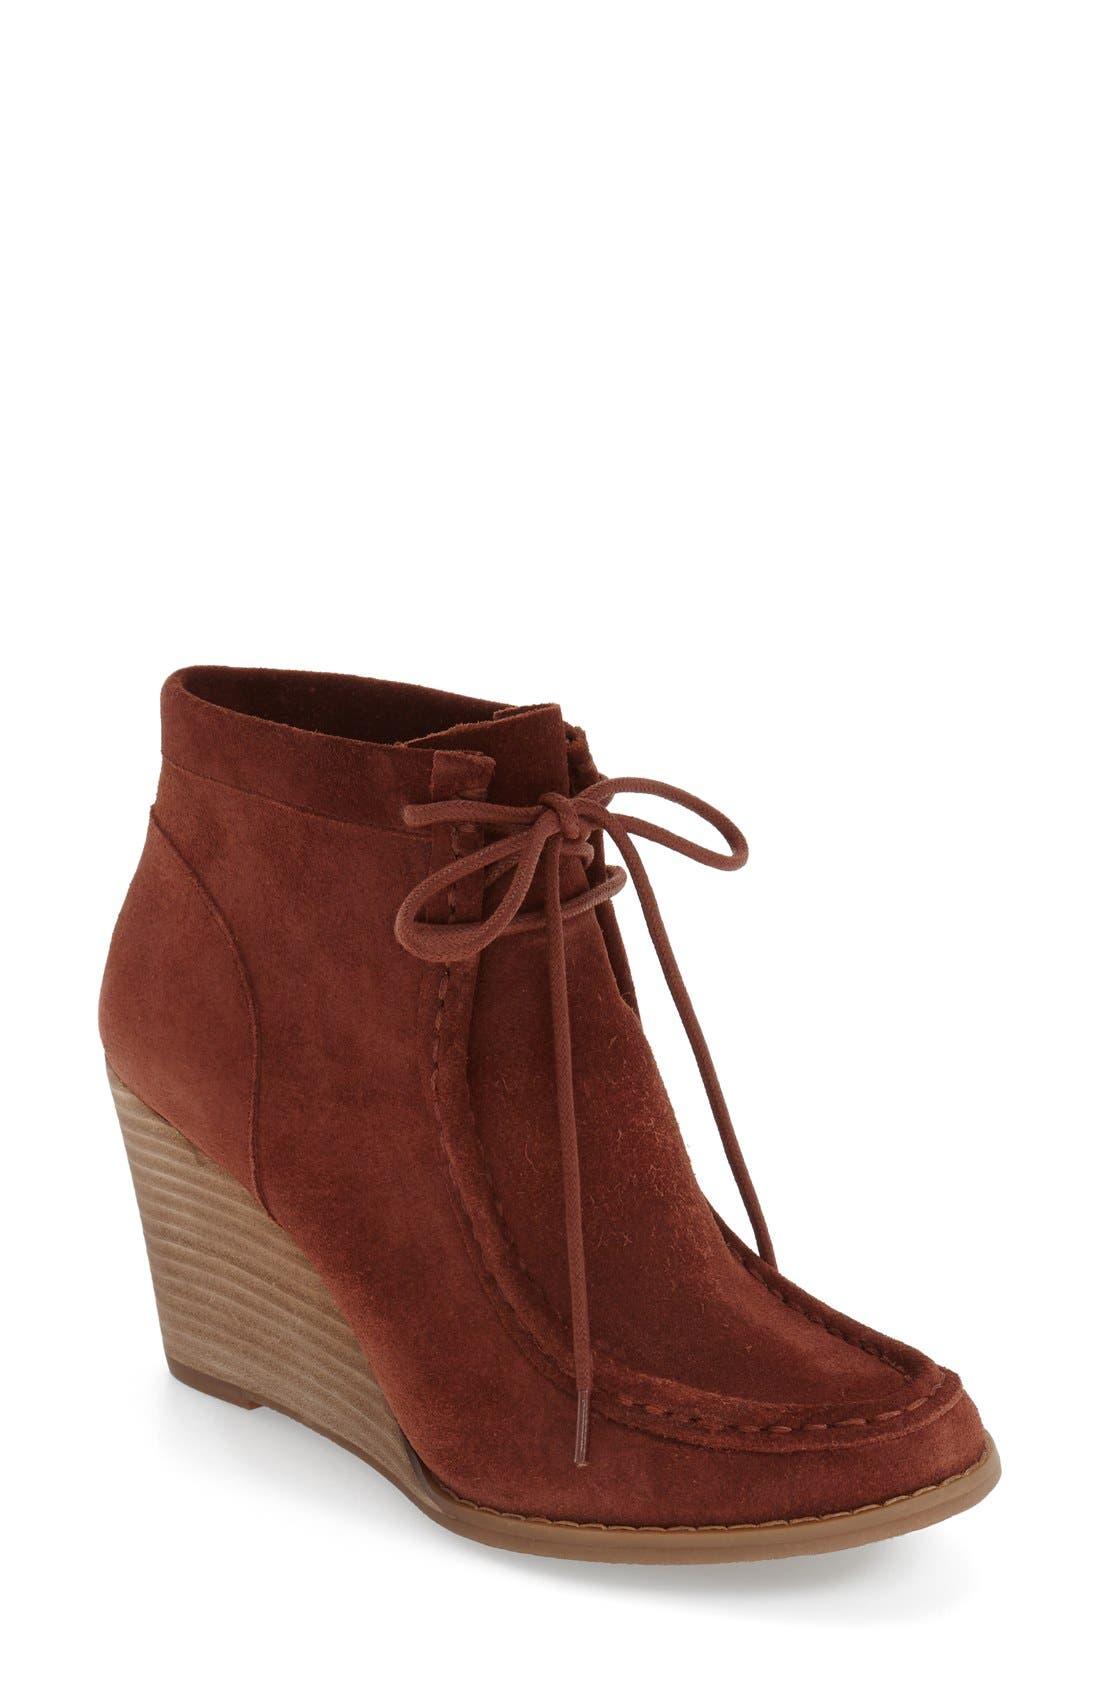 Alternate Image 1 Selected - Lucky Brand 'Ysabel' Wedge Chukka Boot (Women)